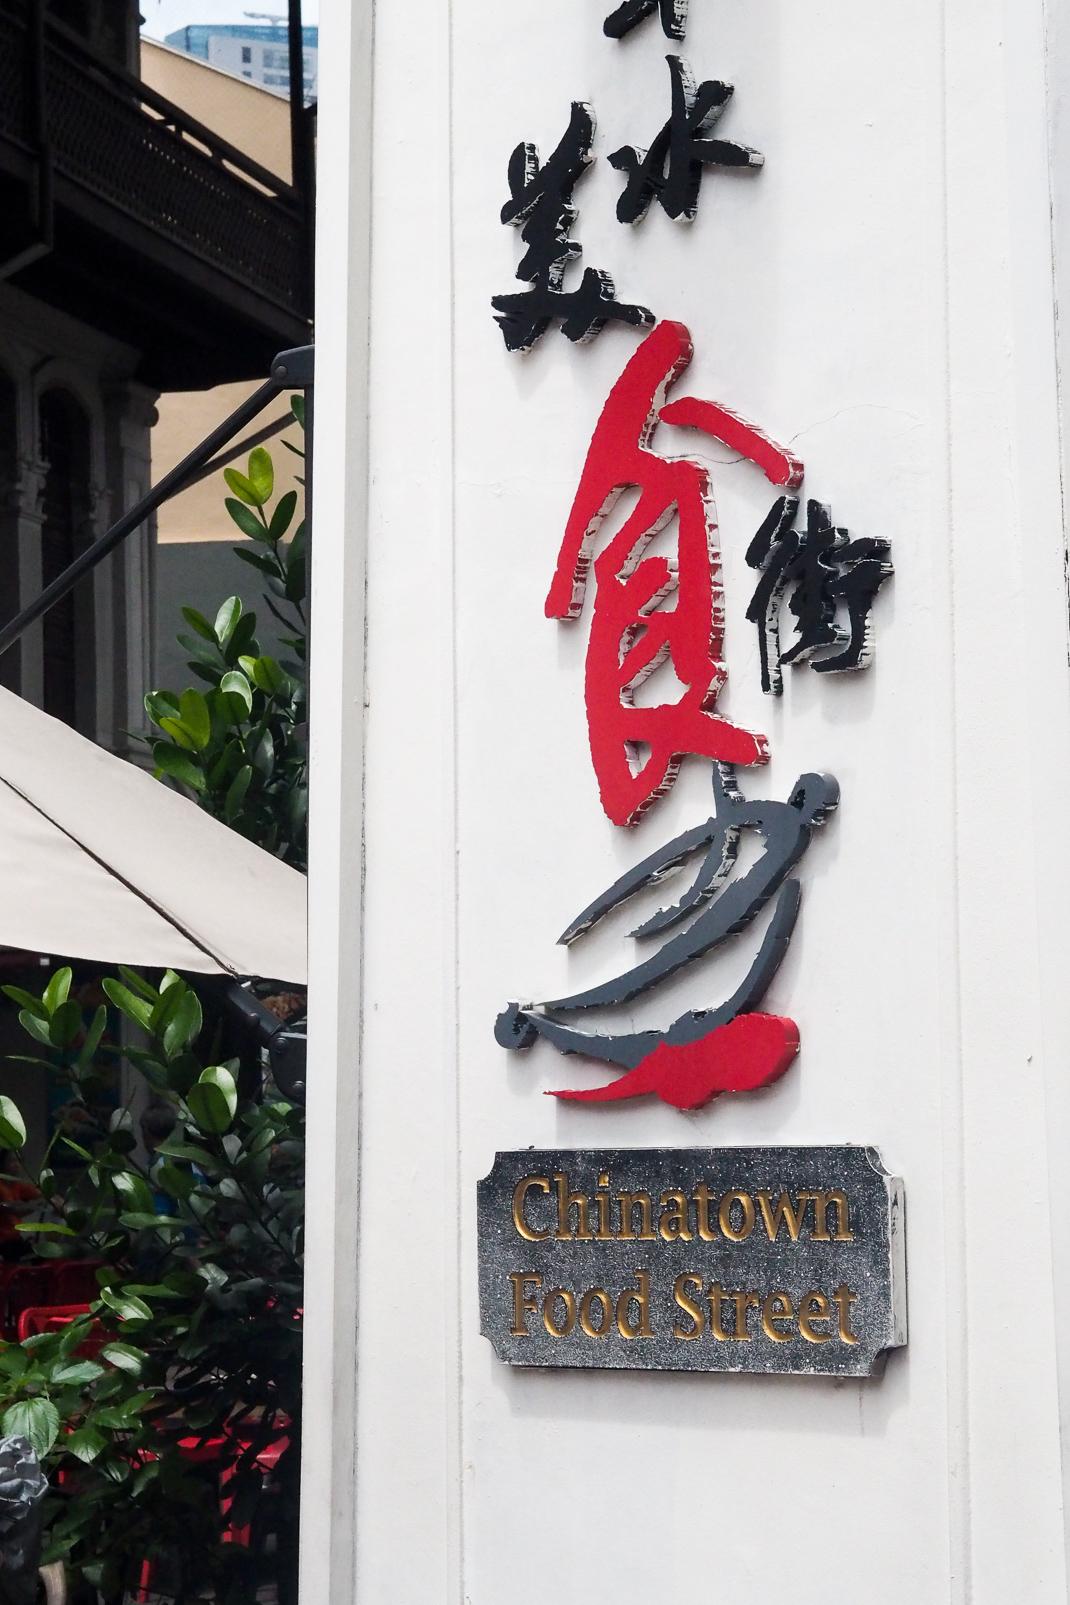 food street, chinatown singapore